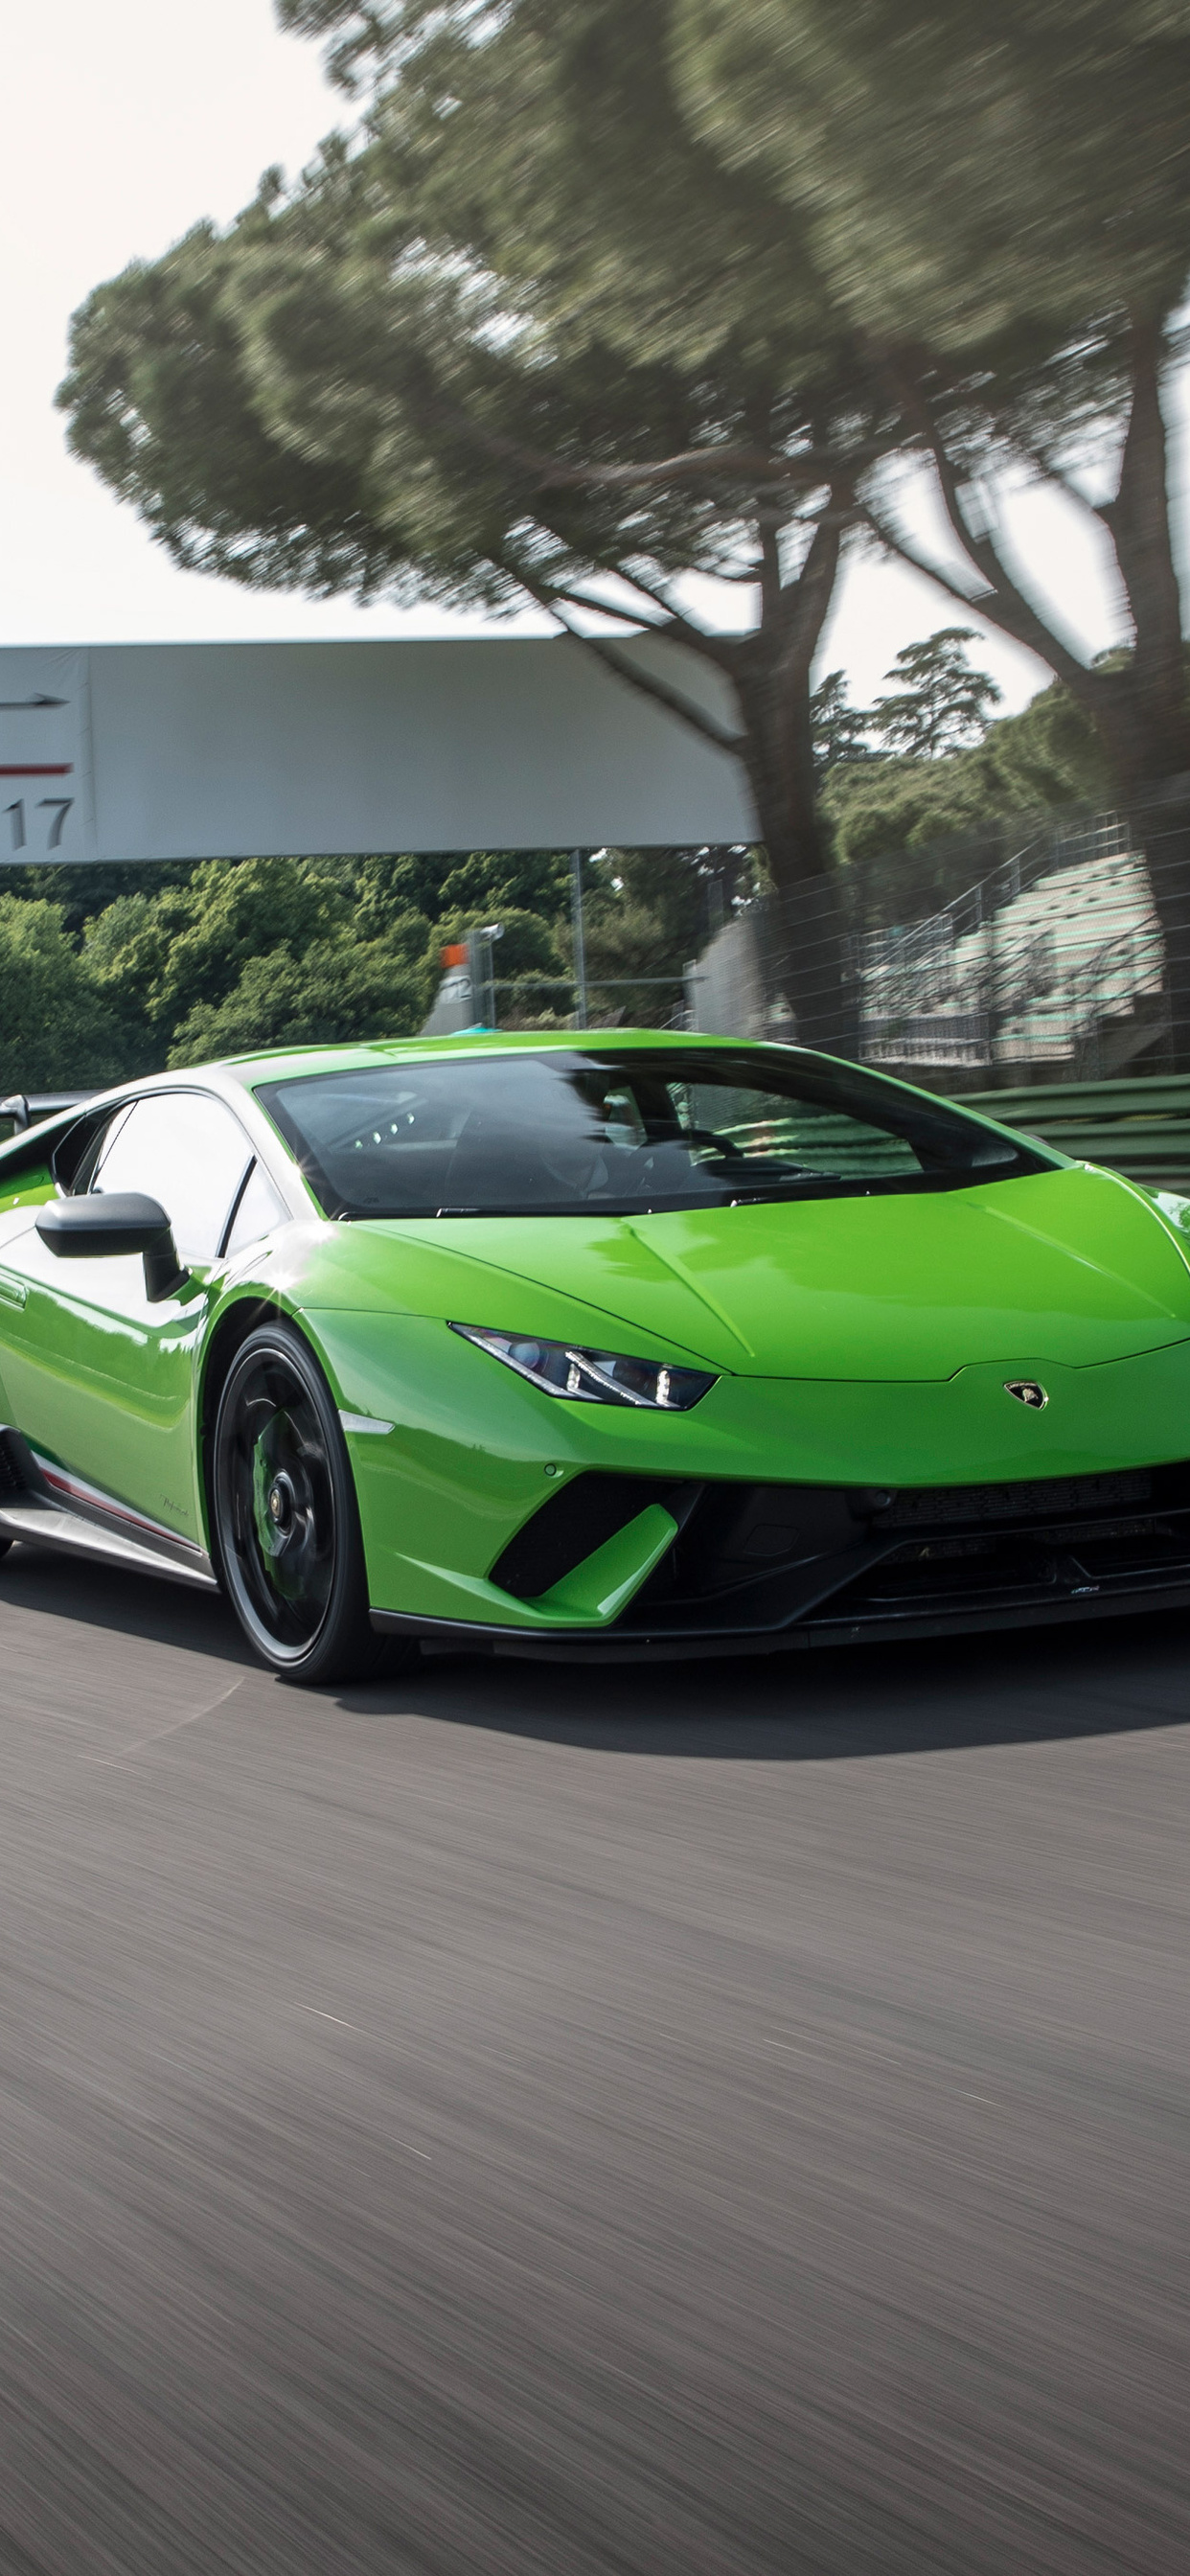 1242x2688 Lamborghini Huracan Performante Super Car Iphone